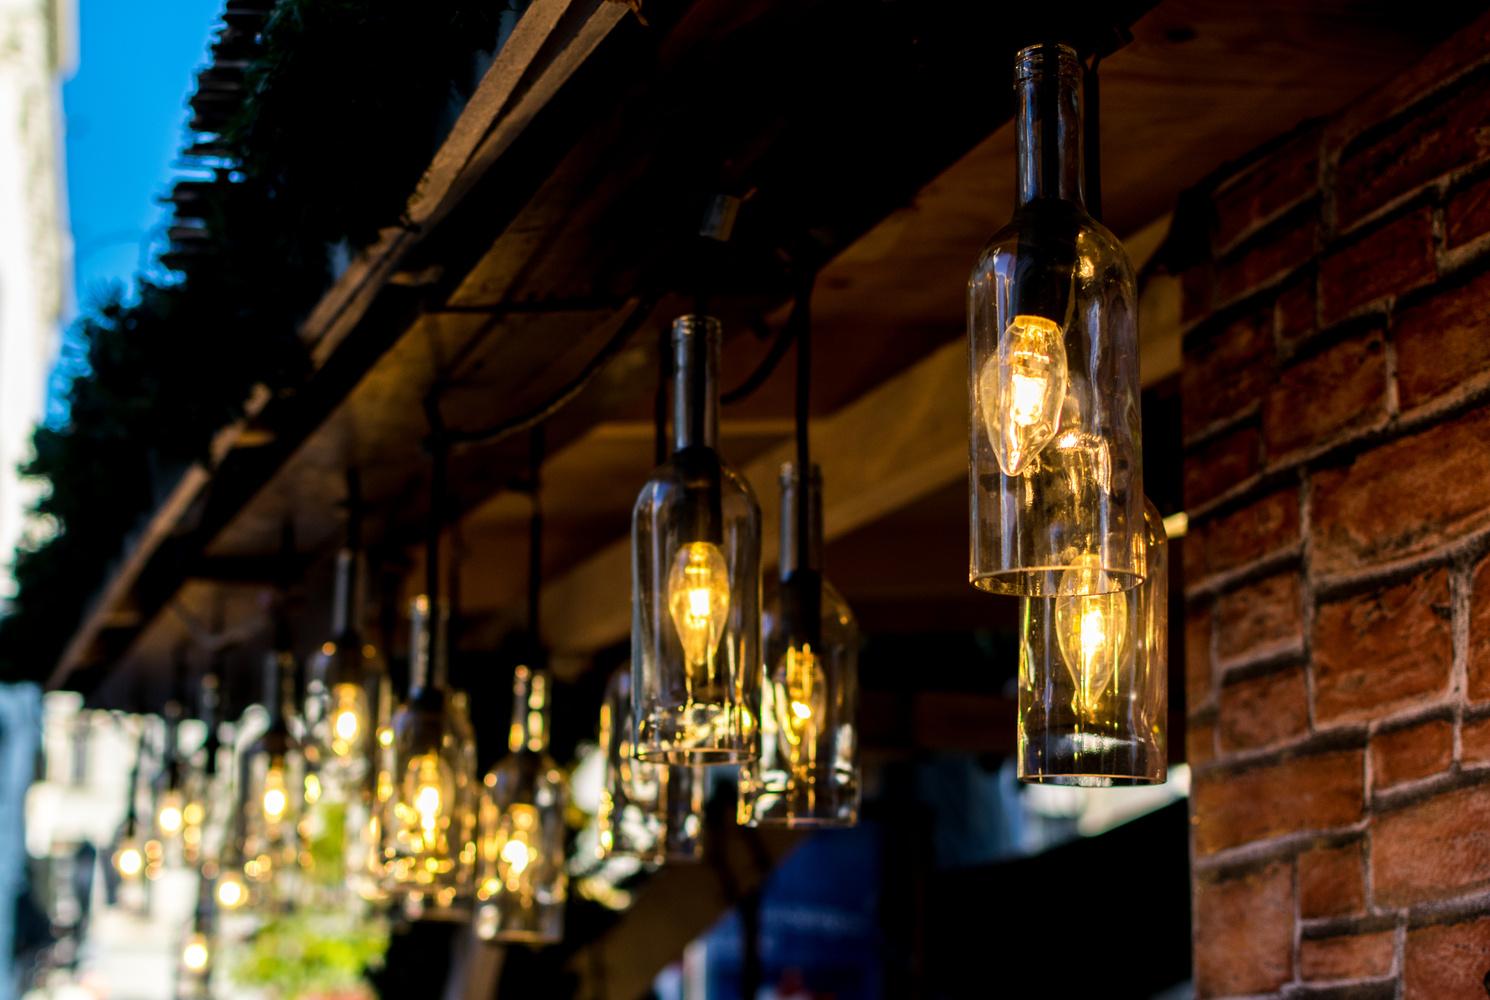 lamps by Anjan Banerjee